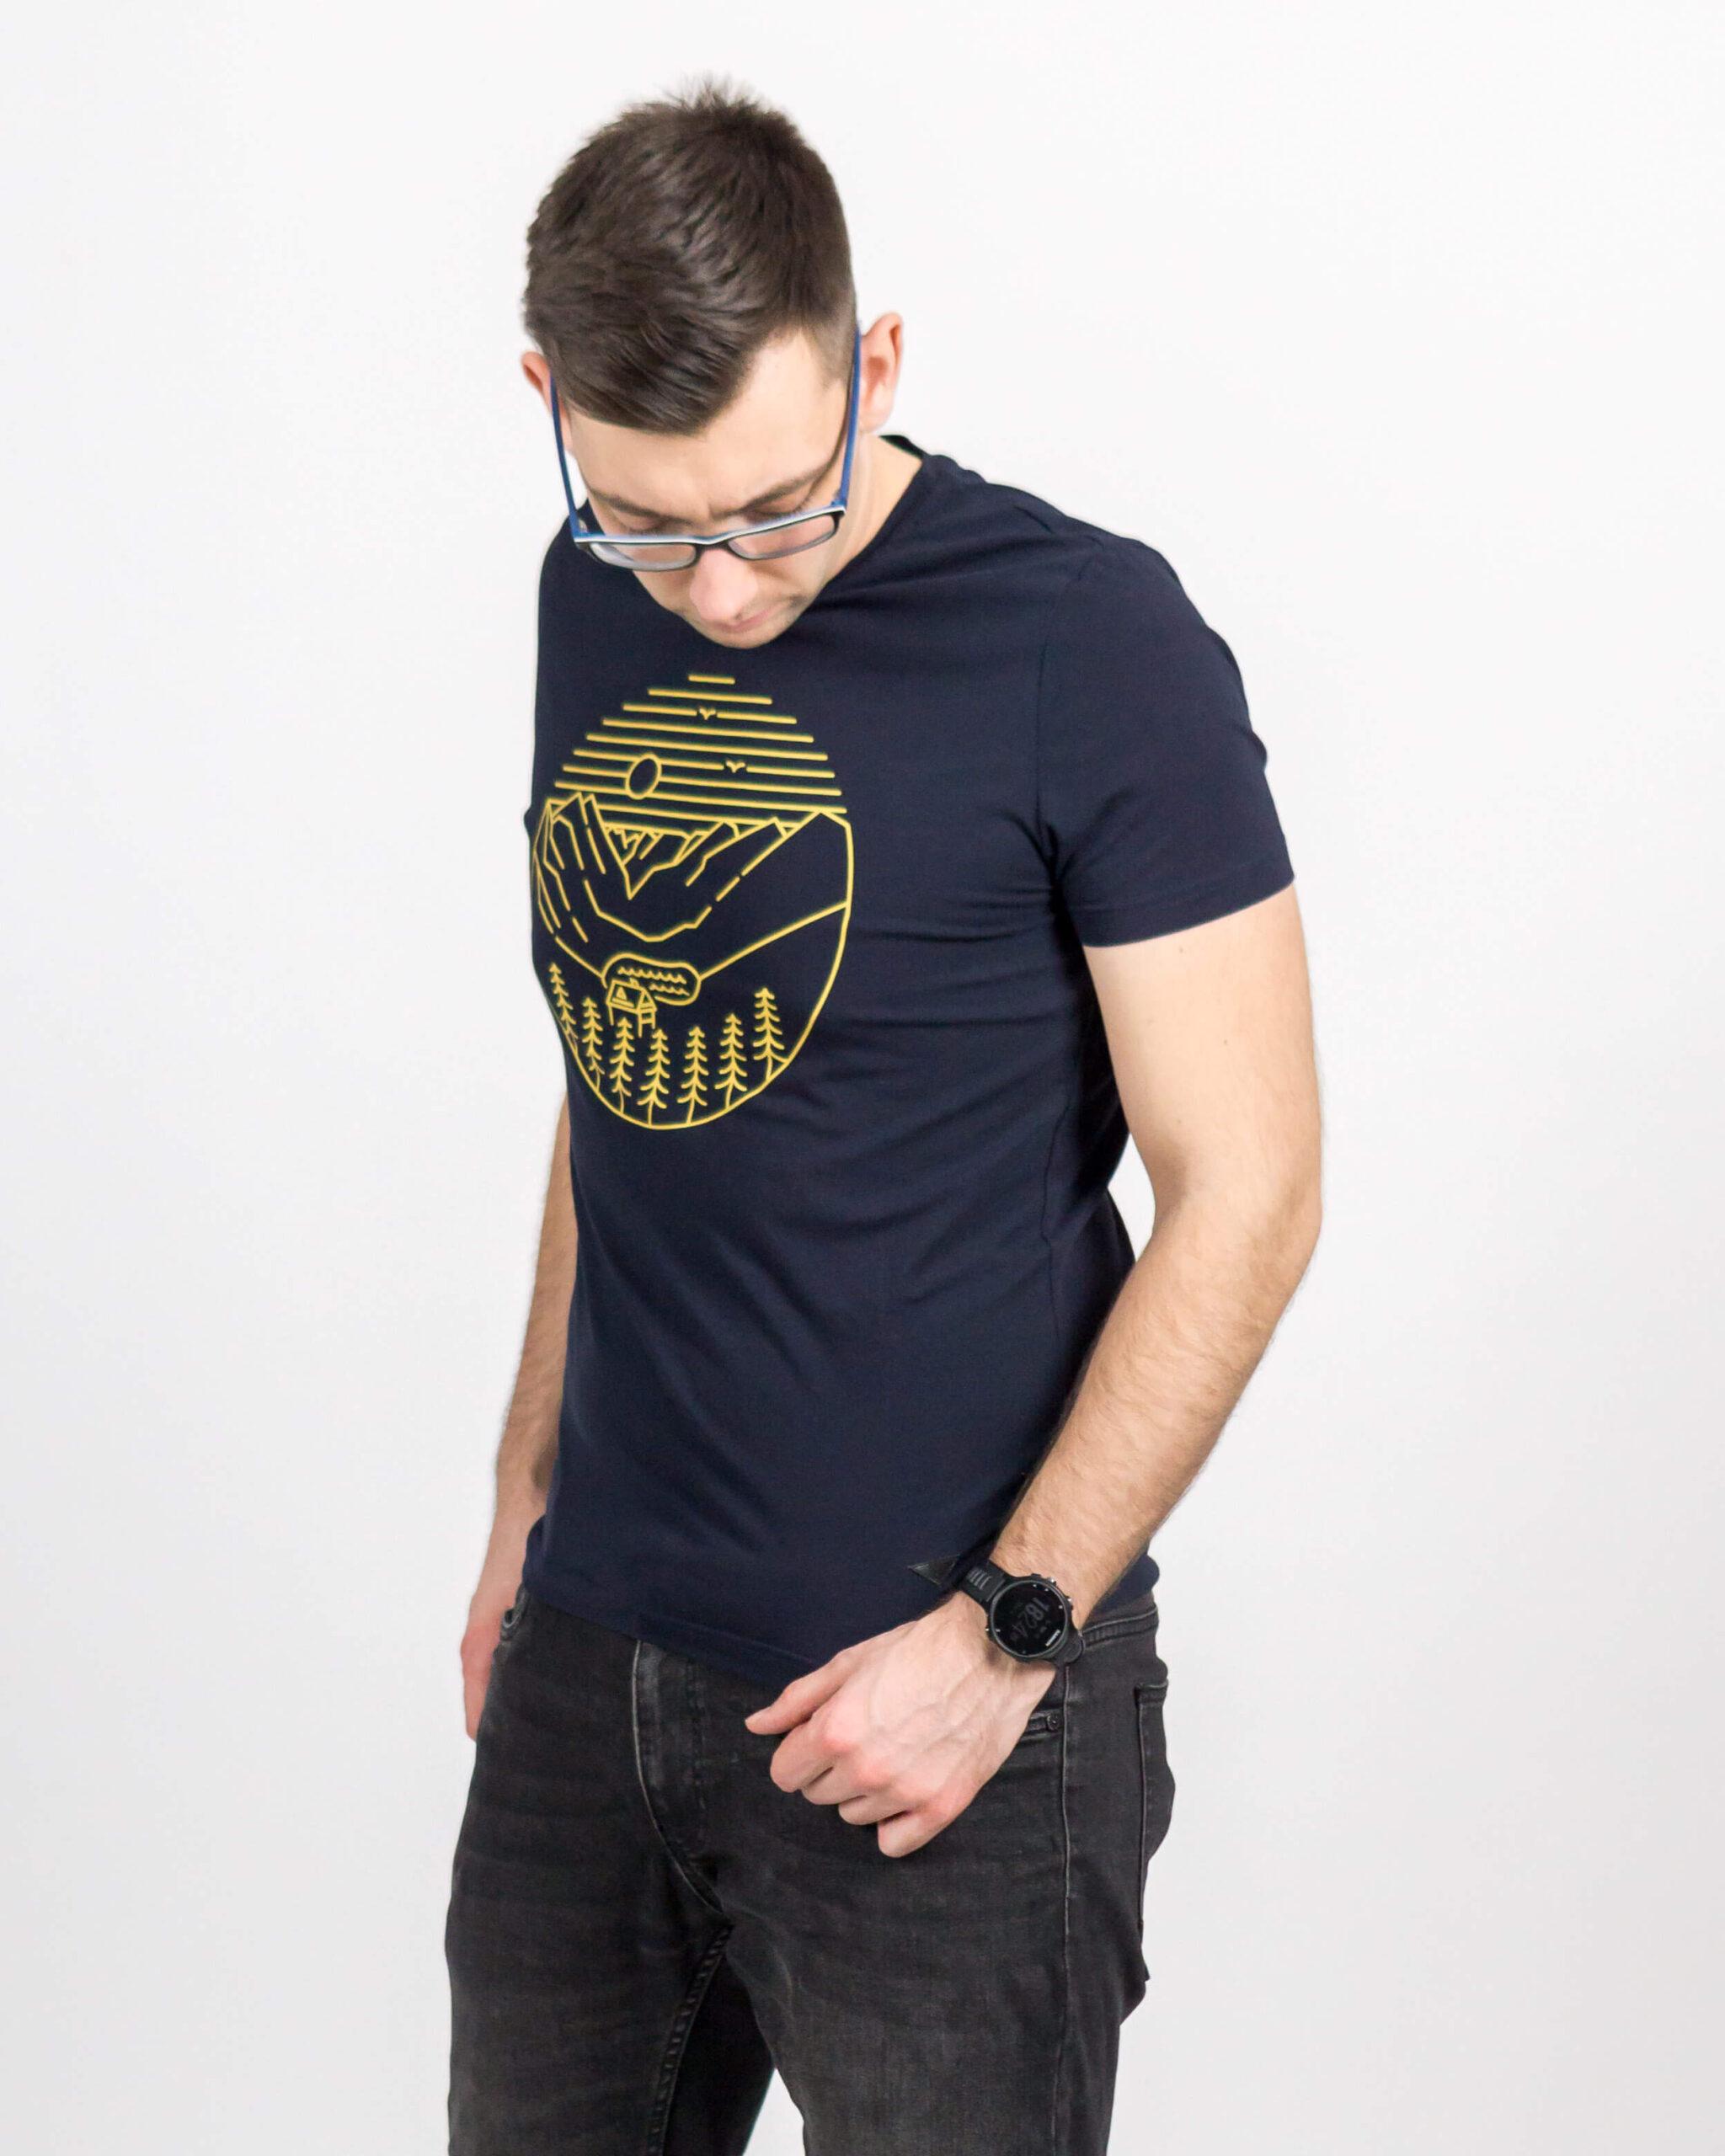 Koszulka Morskie Oko Męska